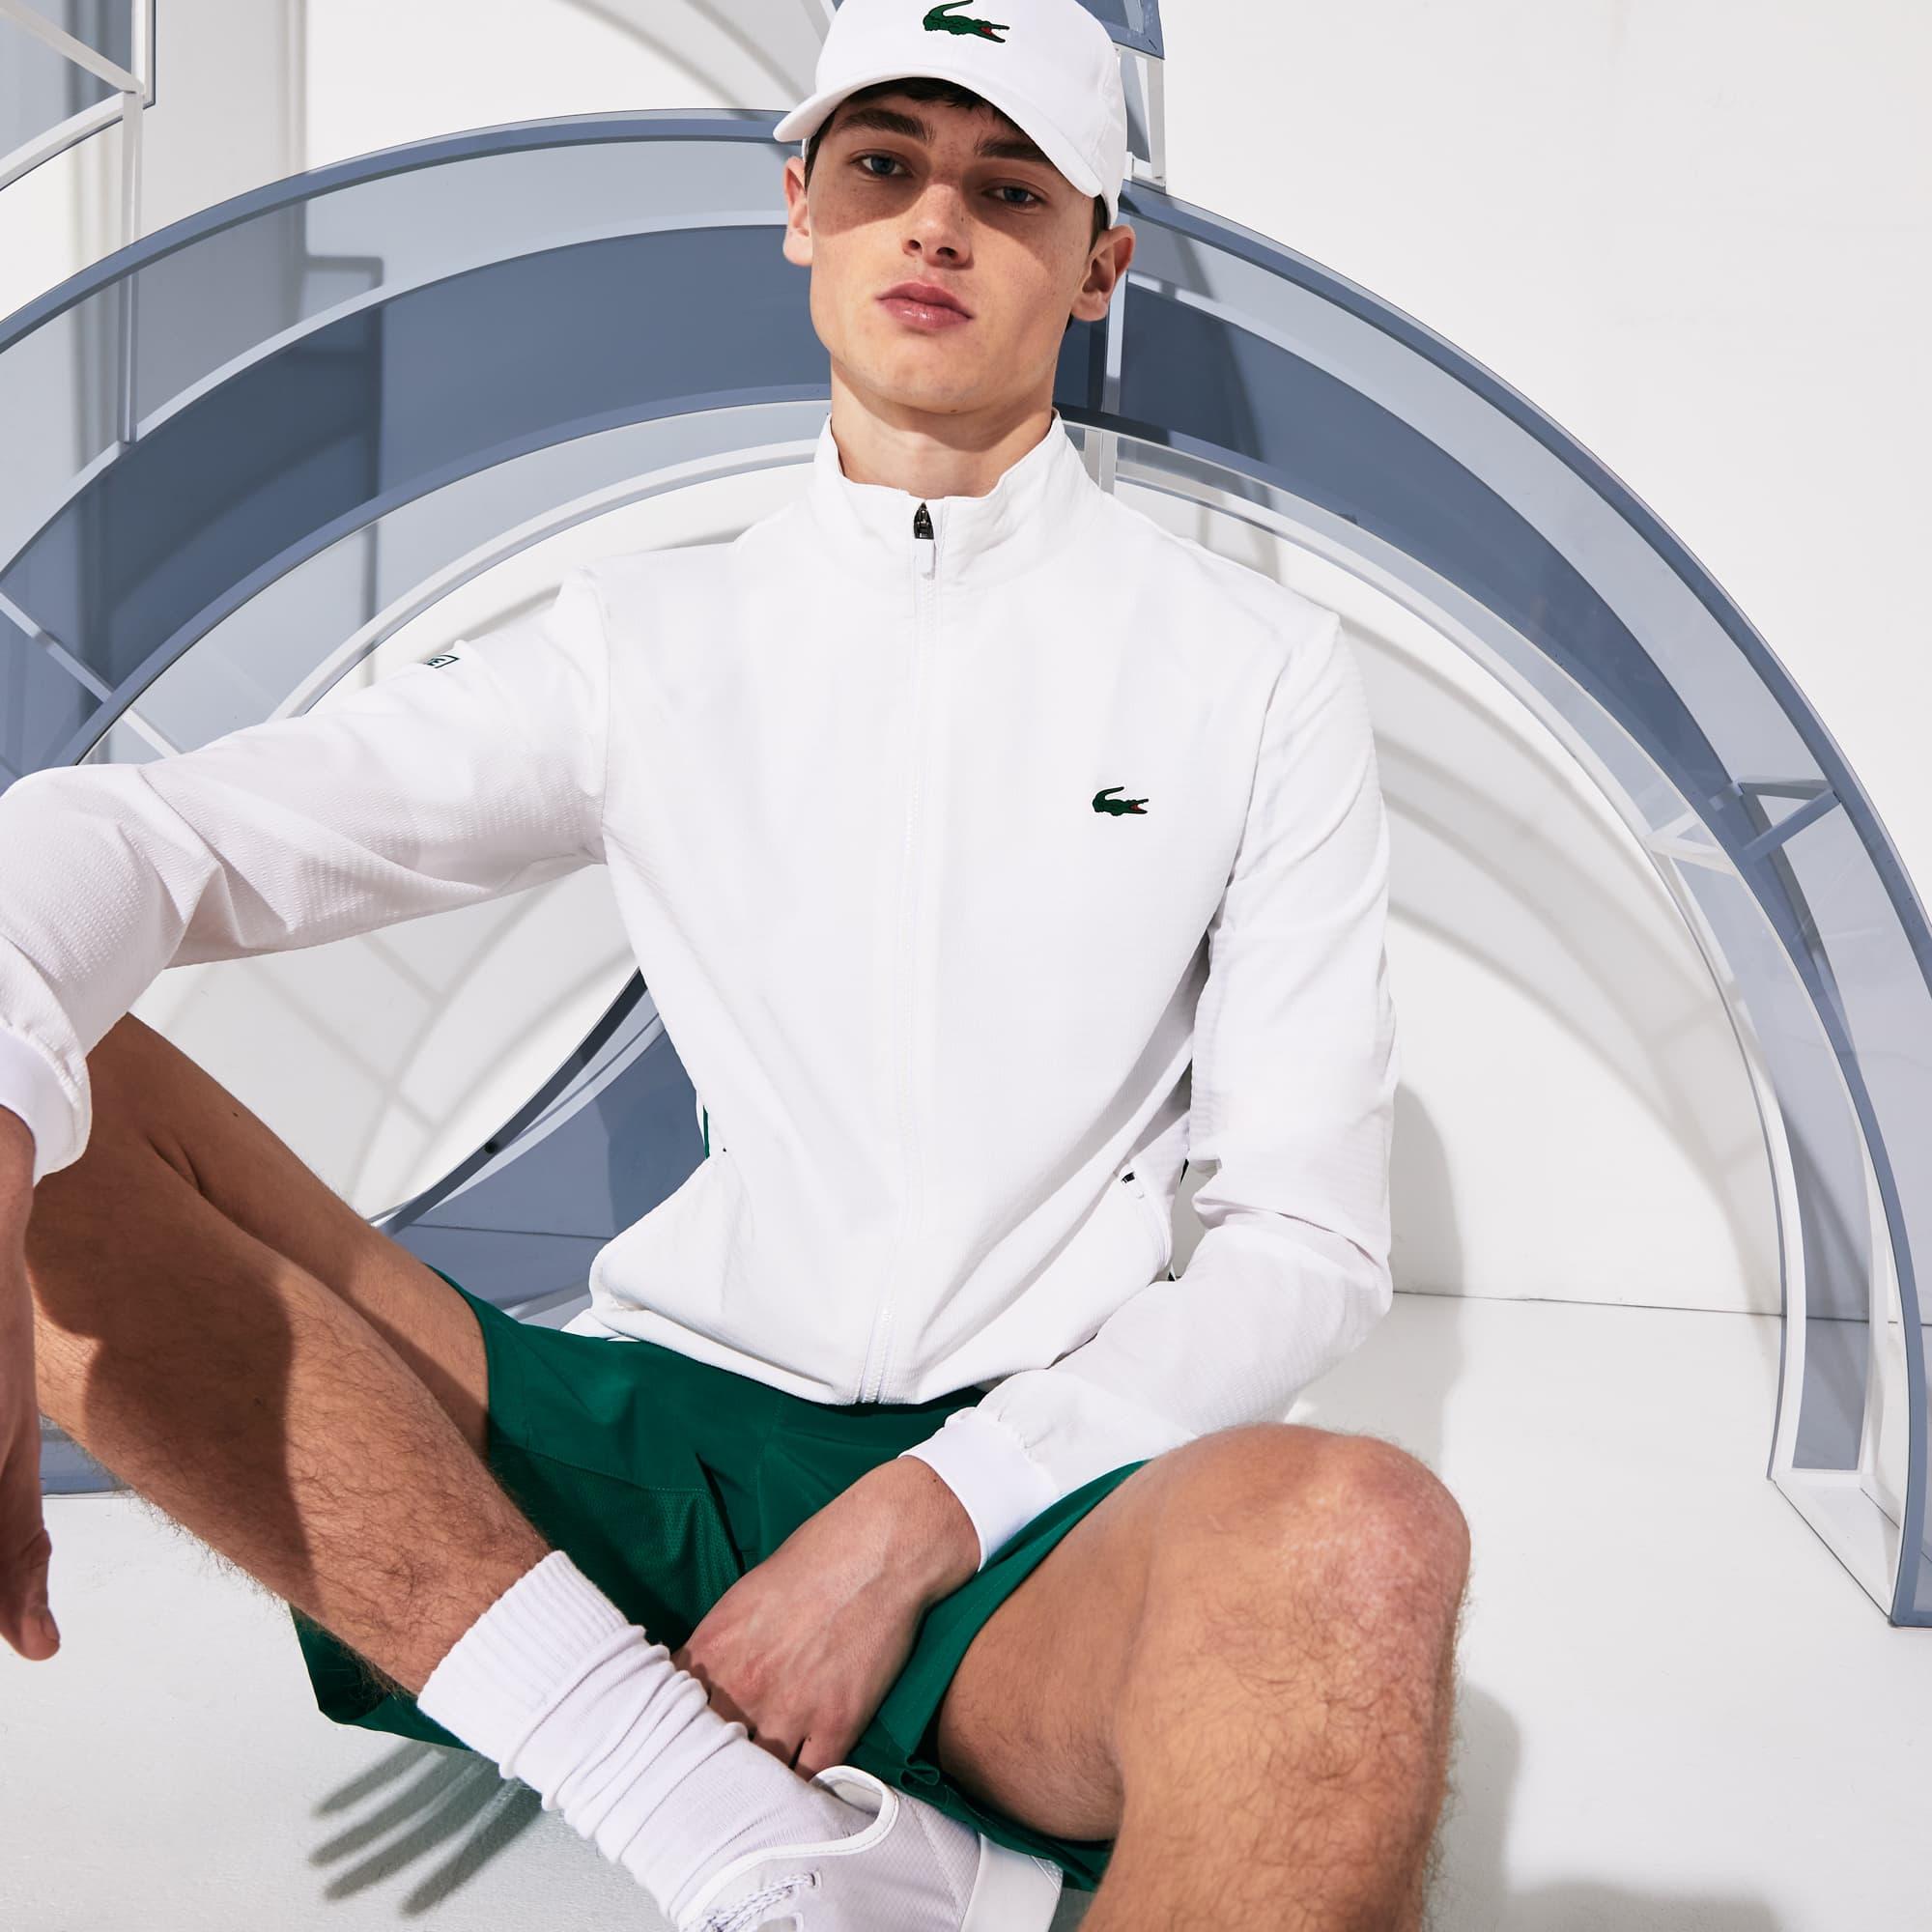 Giacca da uomo con zip testurizzata Lacoste SPORT x Novak Djokovic